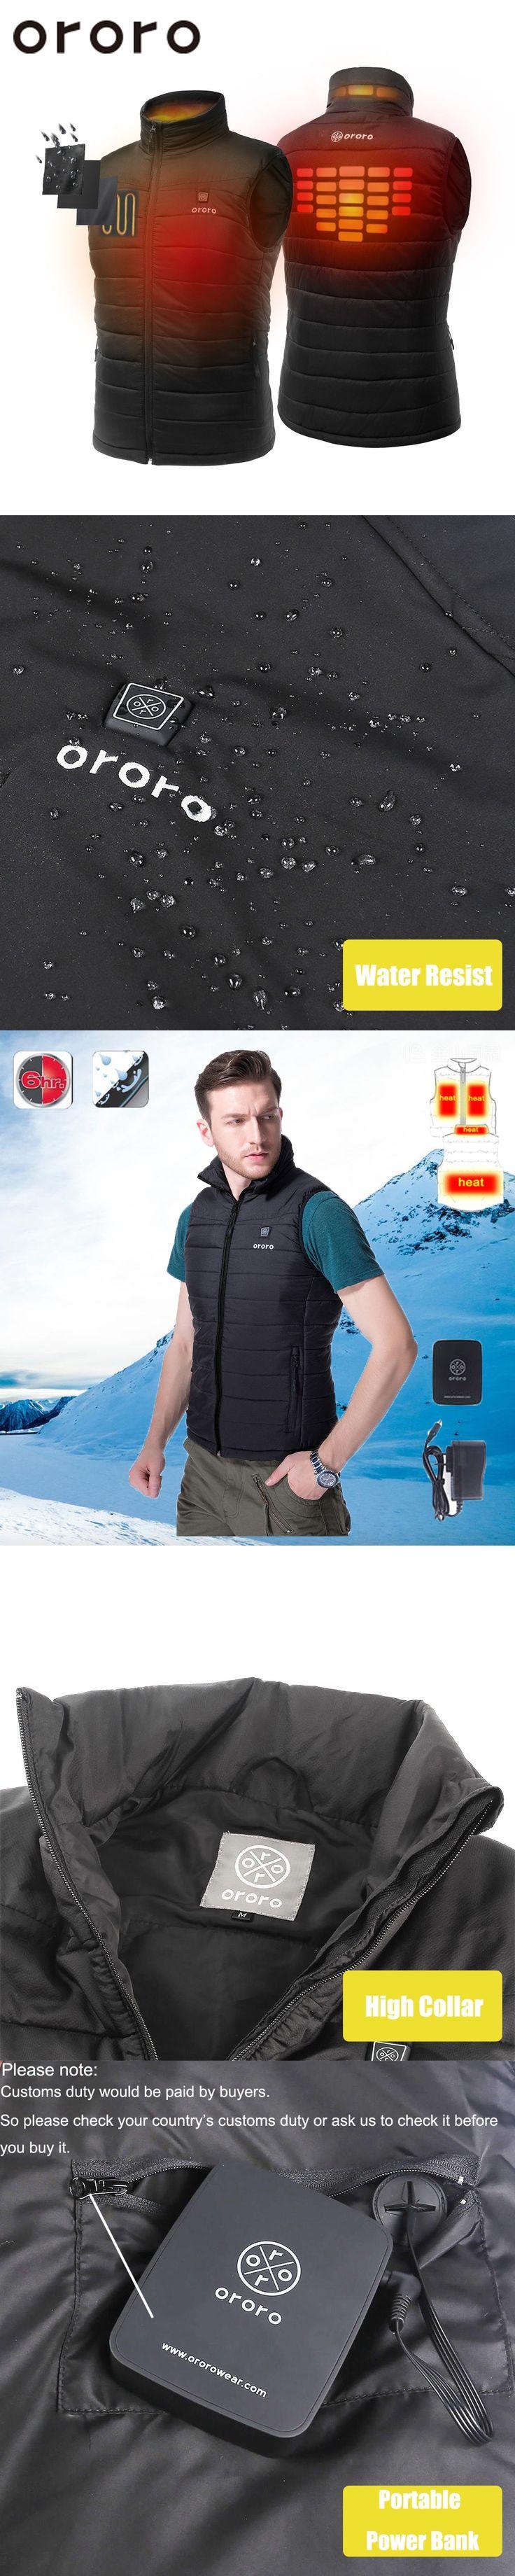 ORORO Black Mens Winter Heated Sleevless Vest Coat Windbreak Resistance Fleece Heated Warm Jacket Vest Heating Jacket